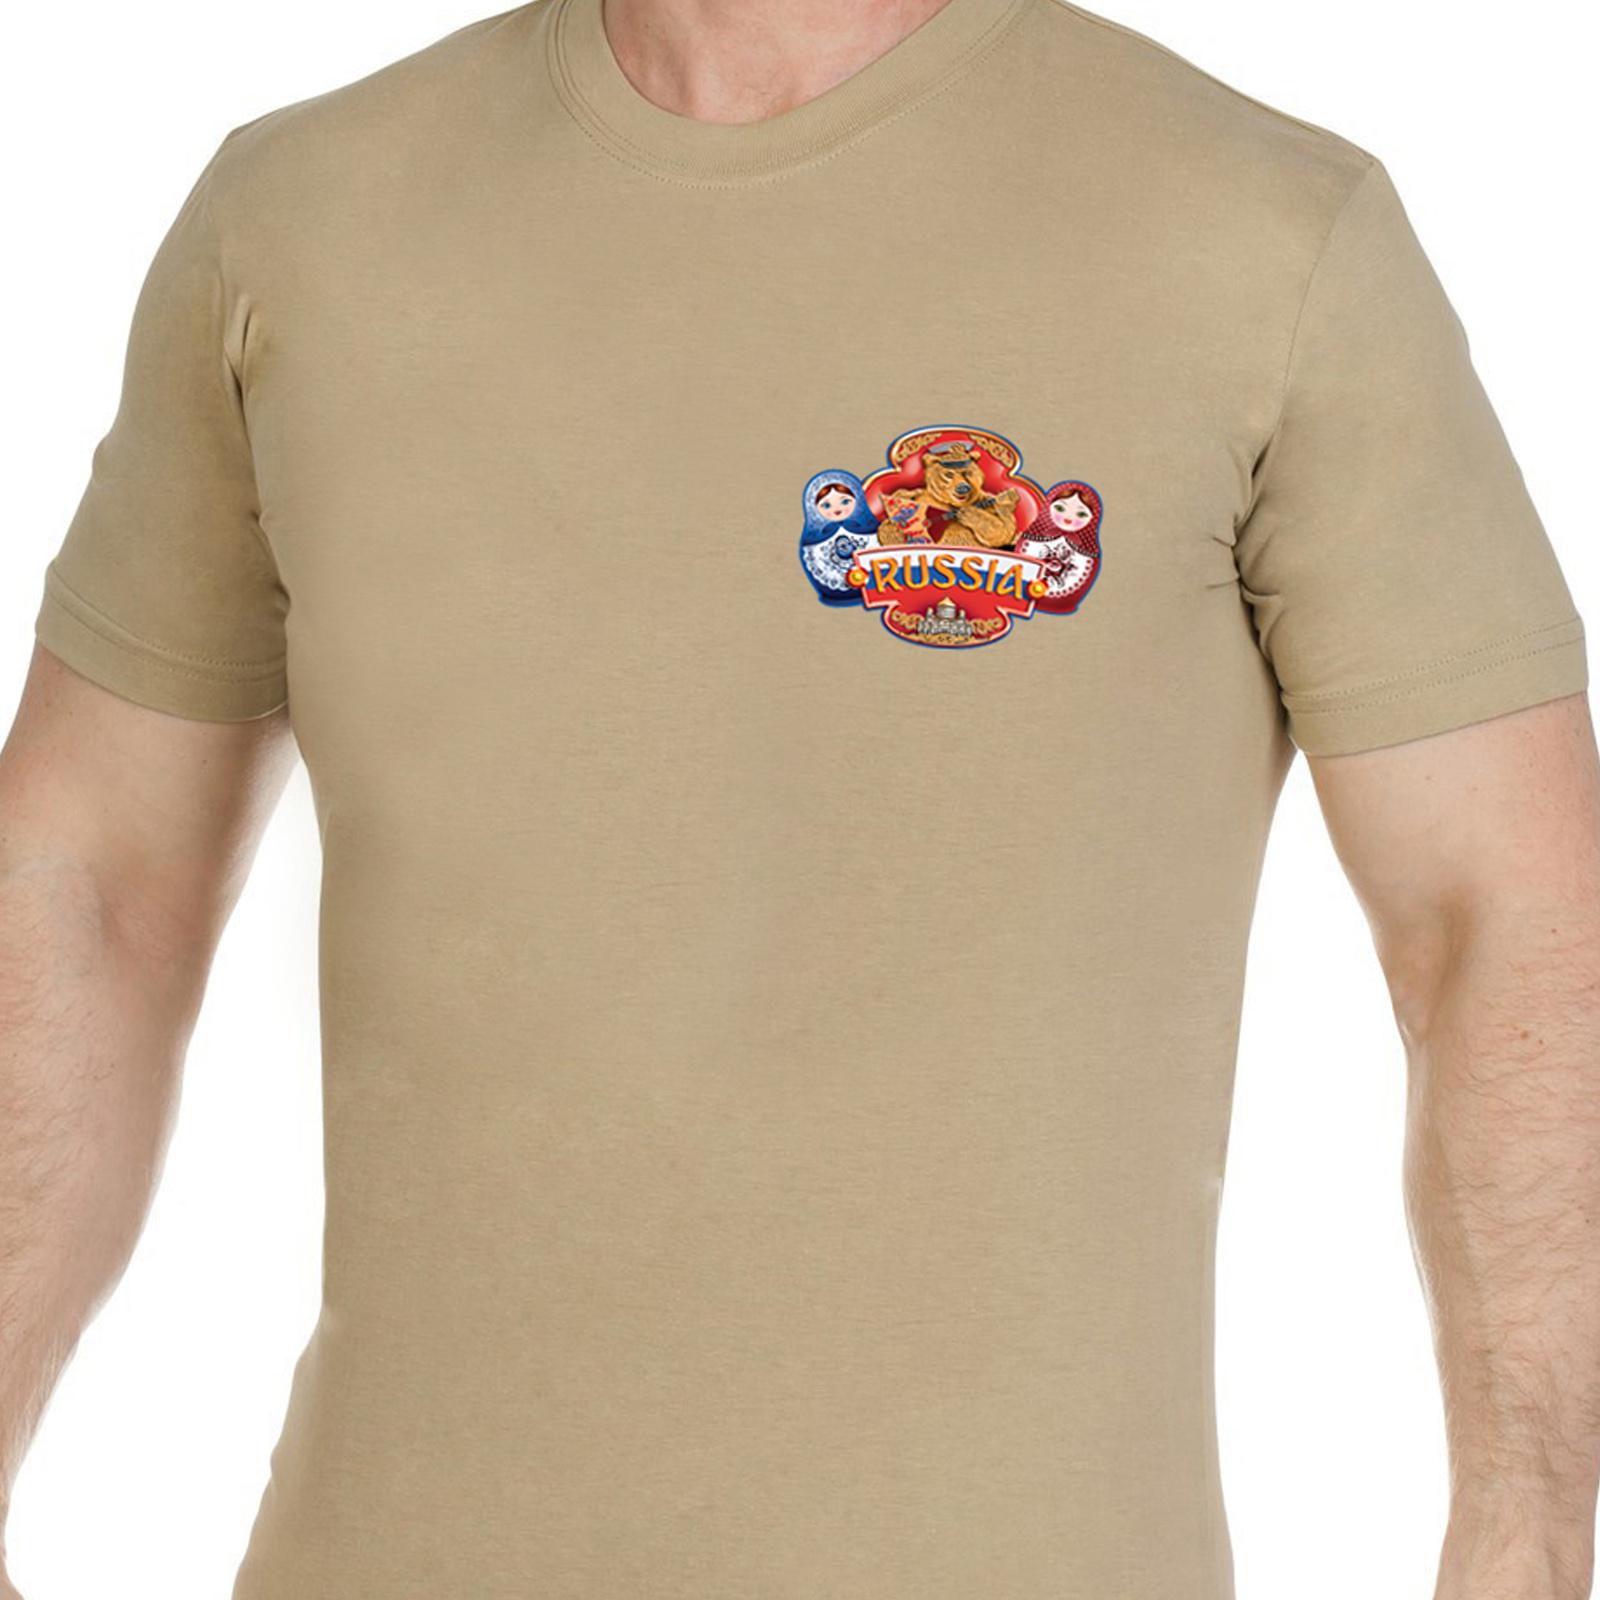 Трикотажная мужская футболка Россия